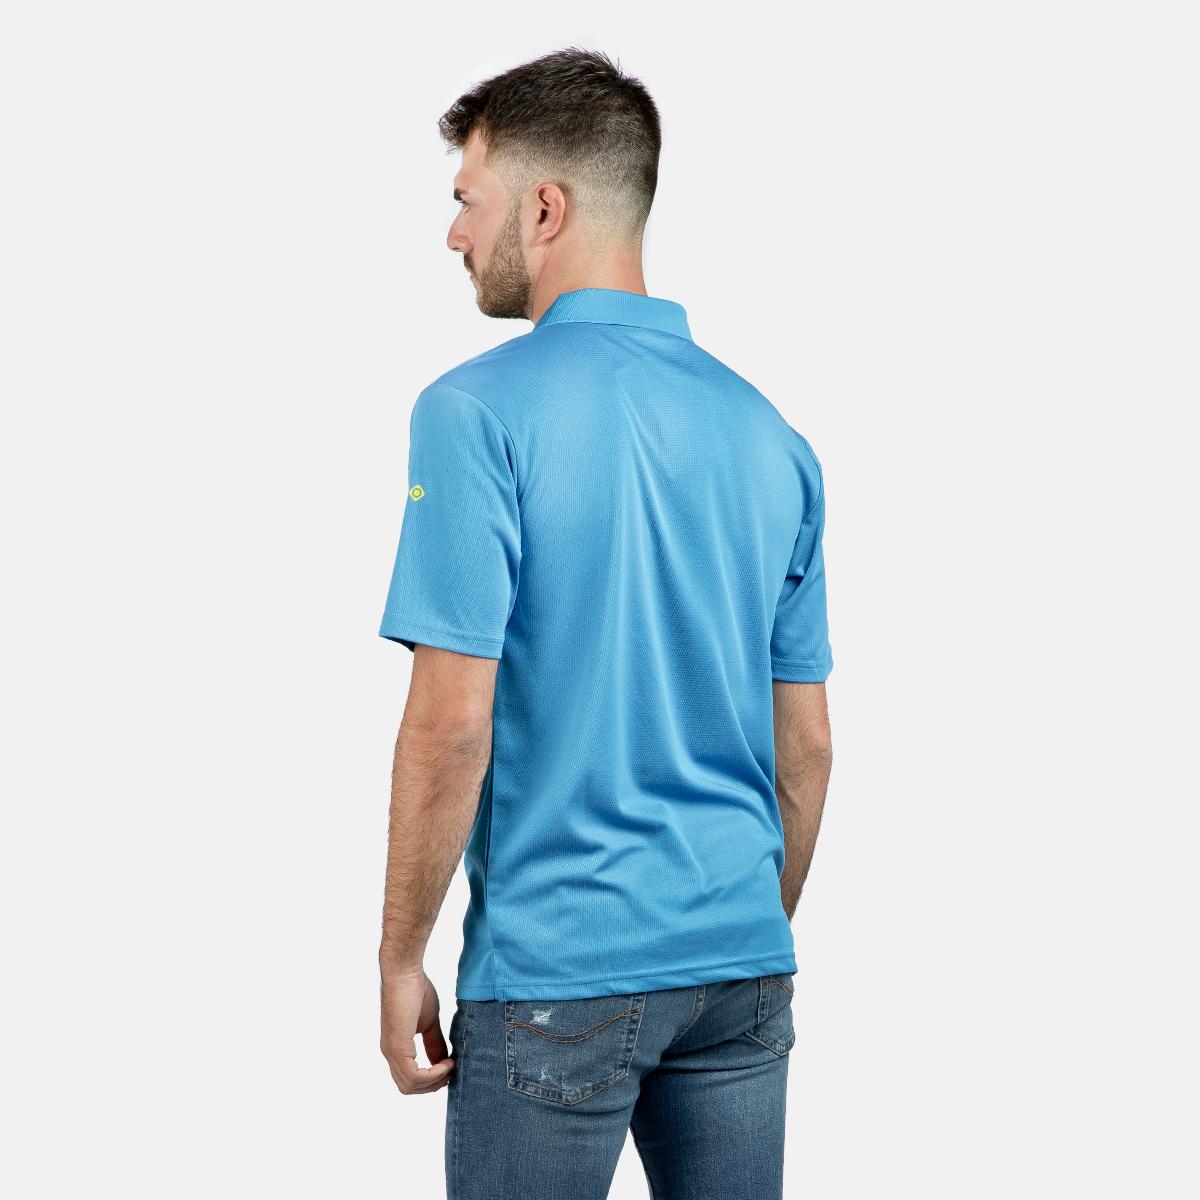 MAN'S ACAY POLO T-SHIRT BLUE